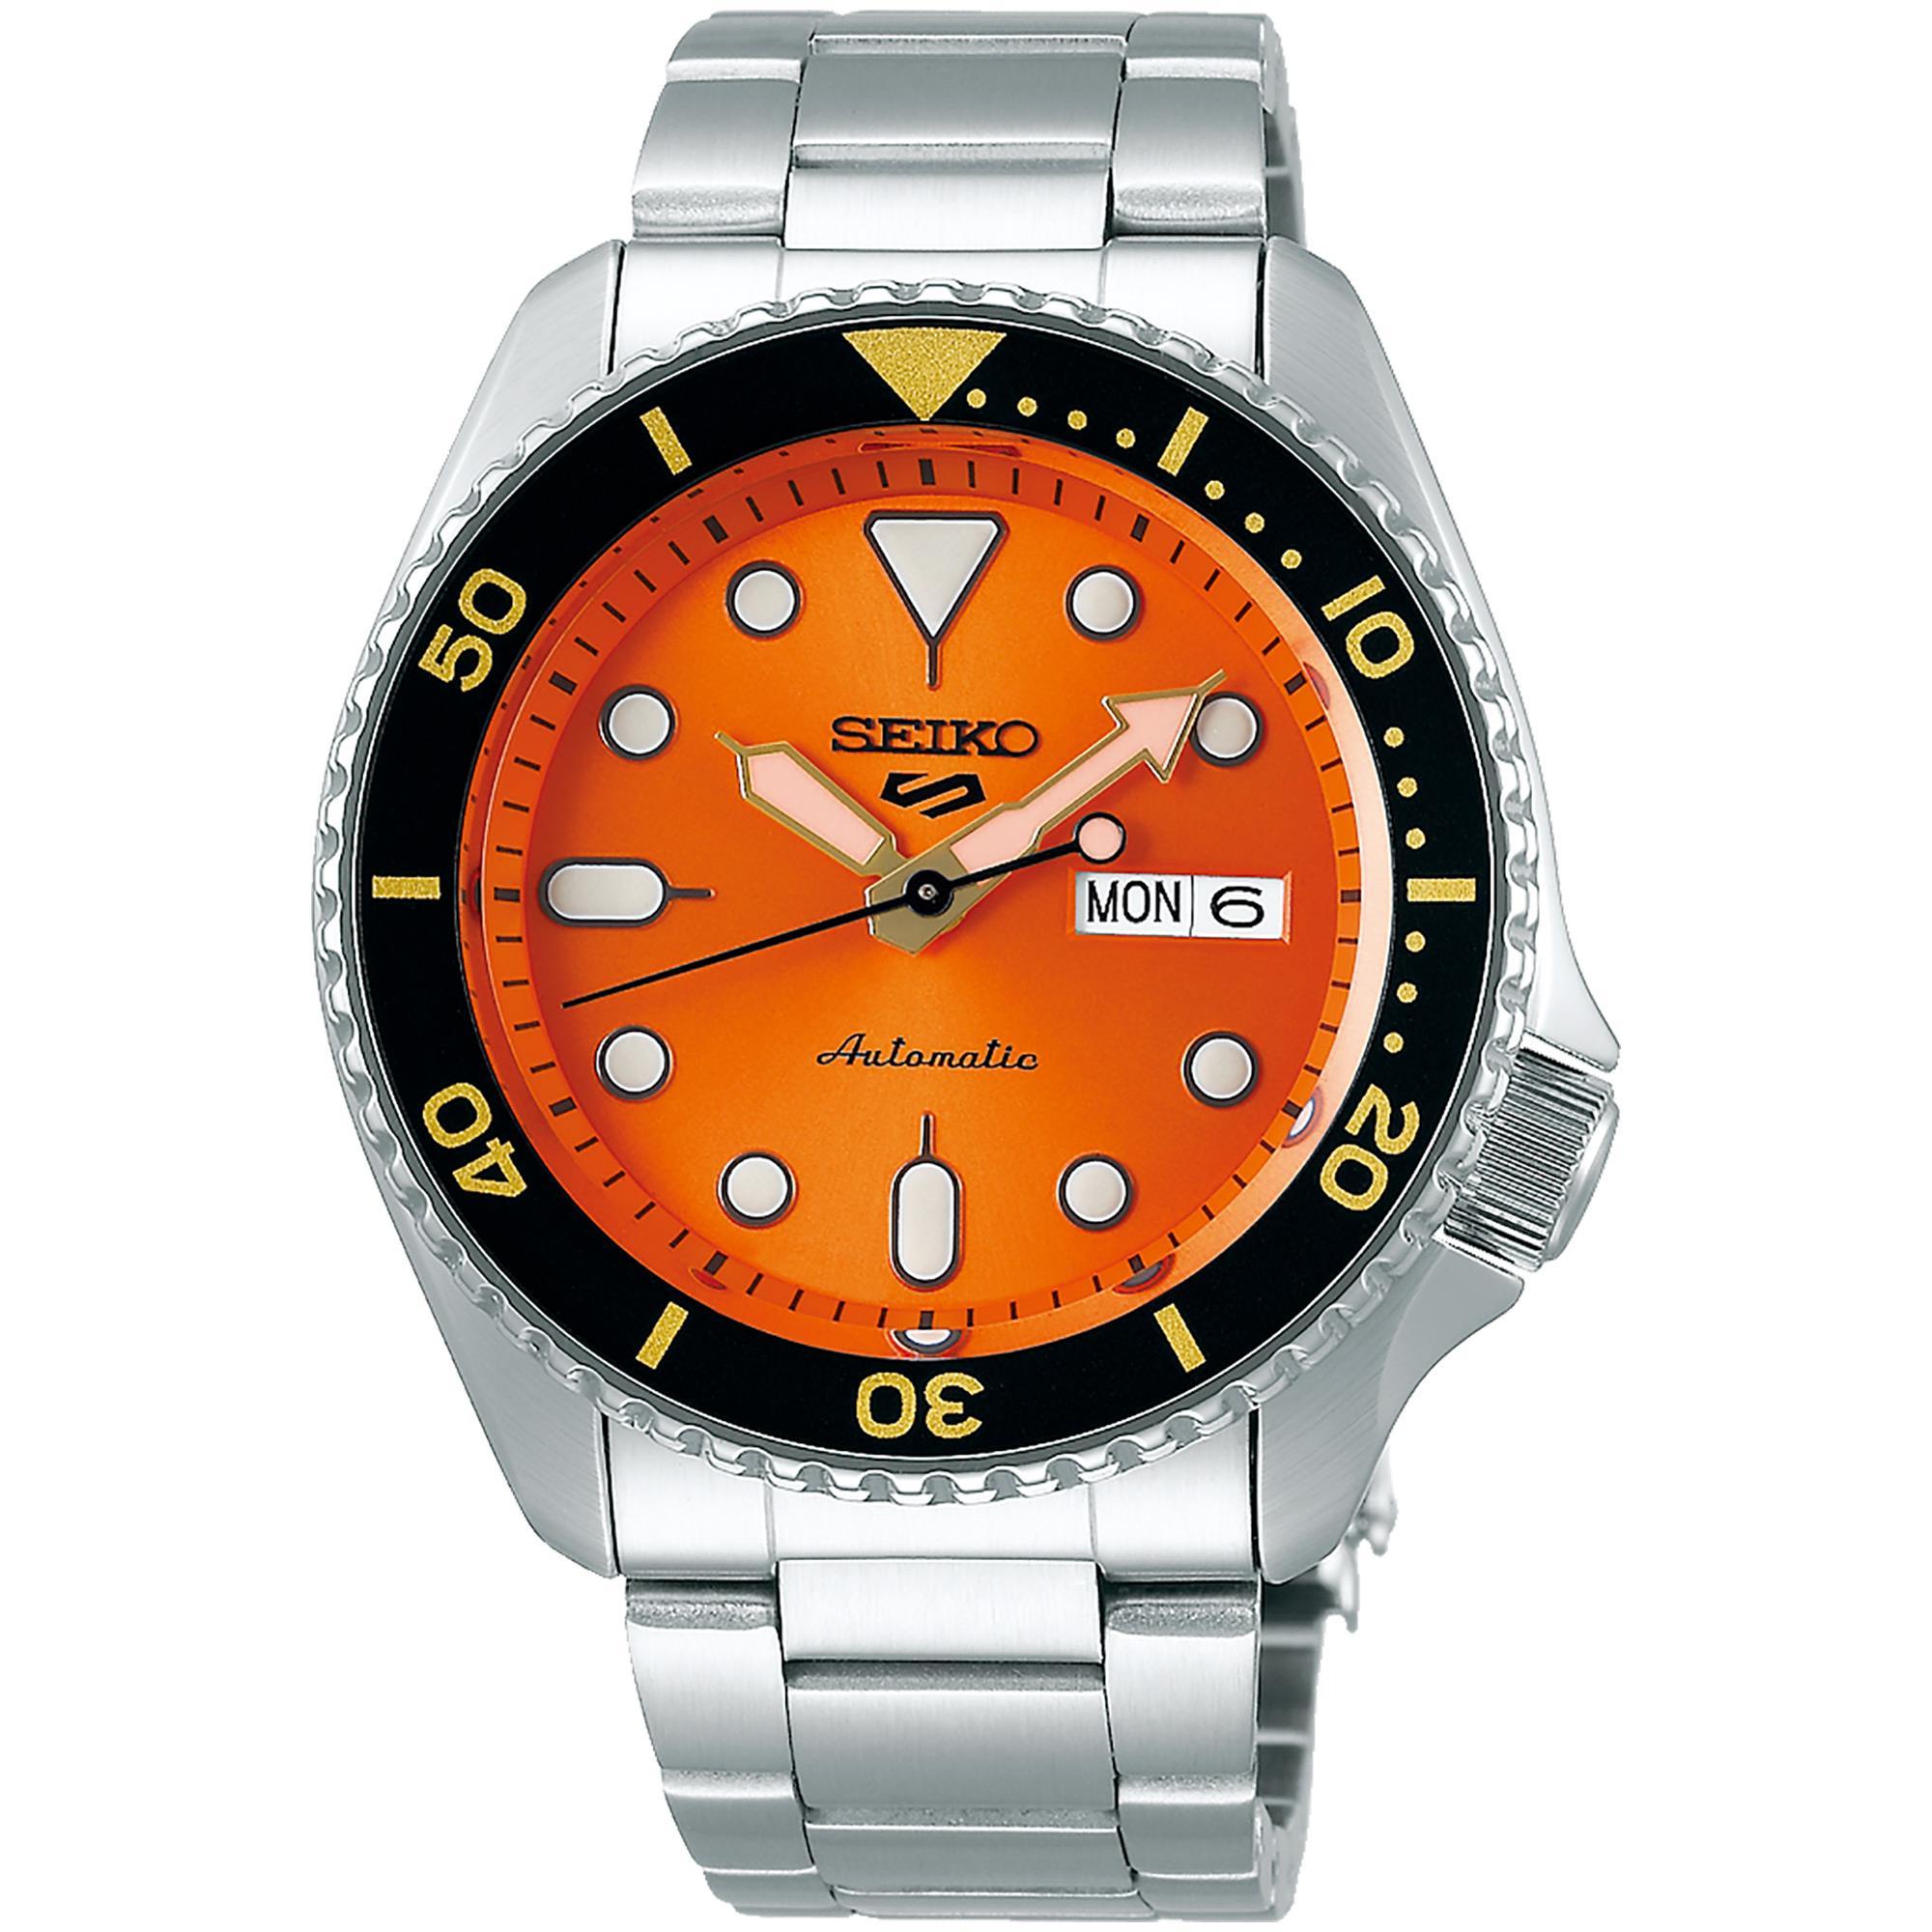 Orologio Seiko 5 Sports Automatico Acciaio Uomo Arancione - SEIKO